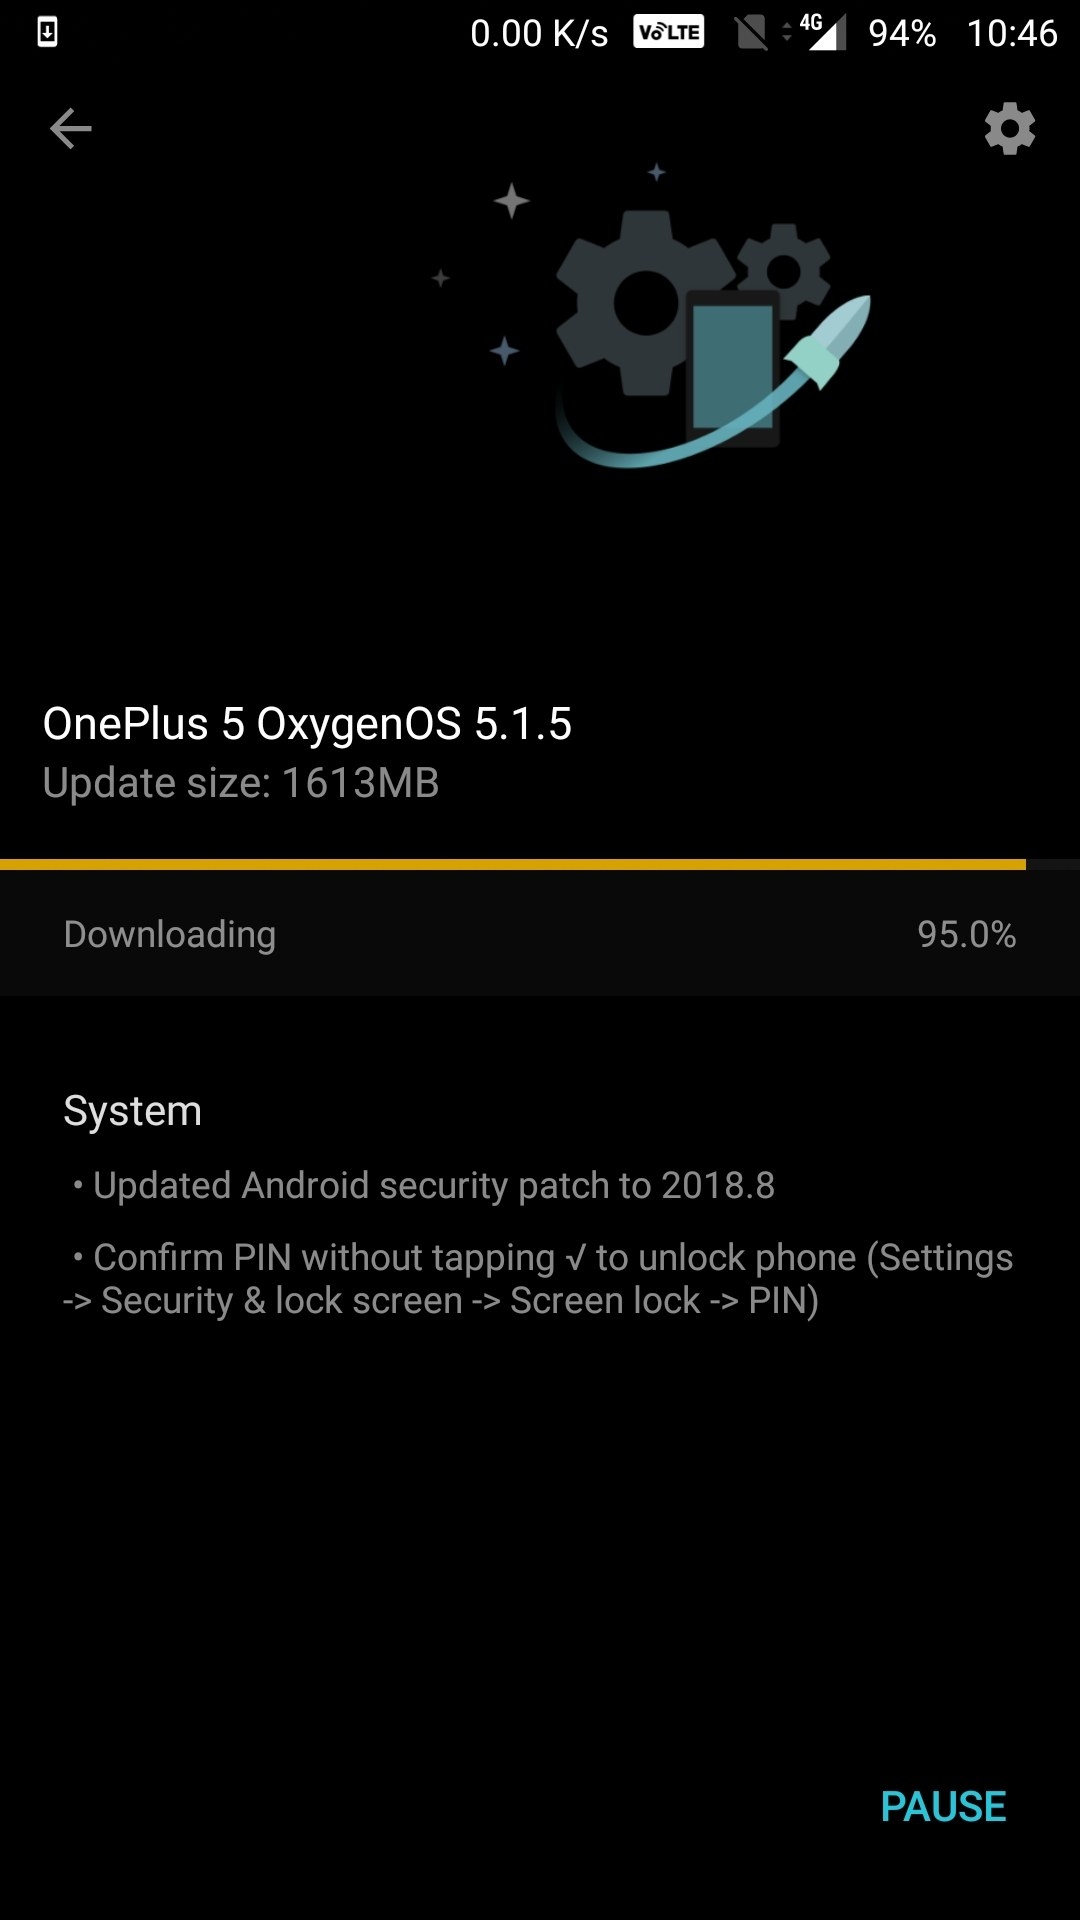 OxygenOS 5.1.5